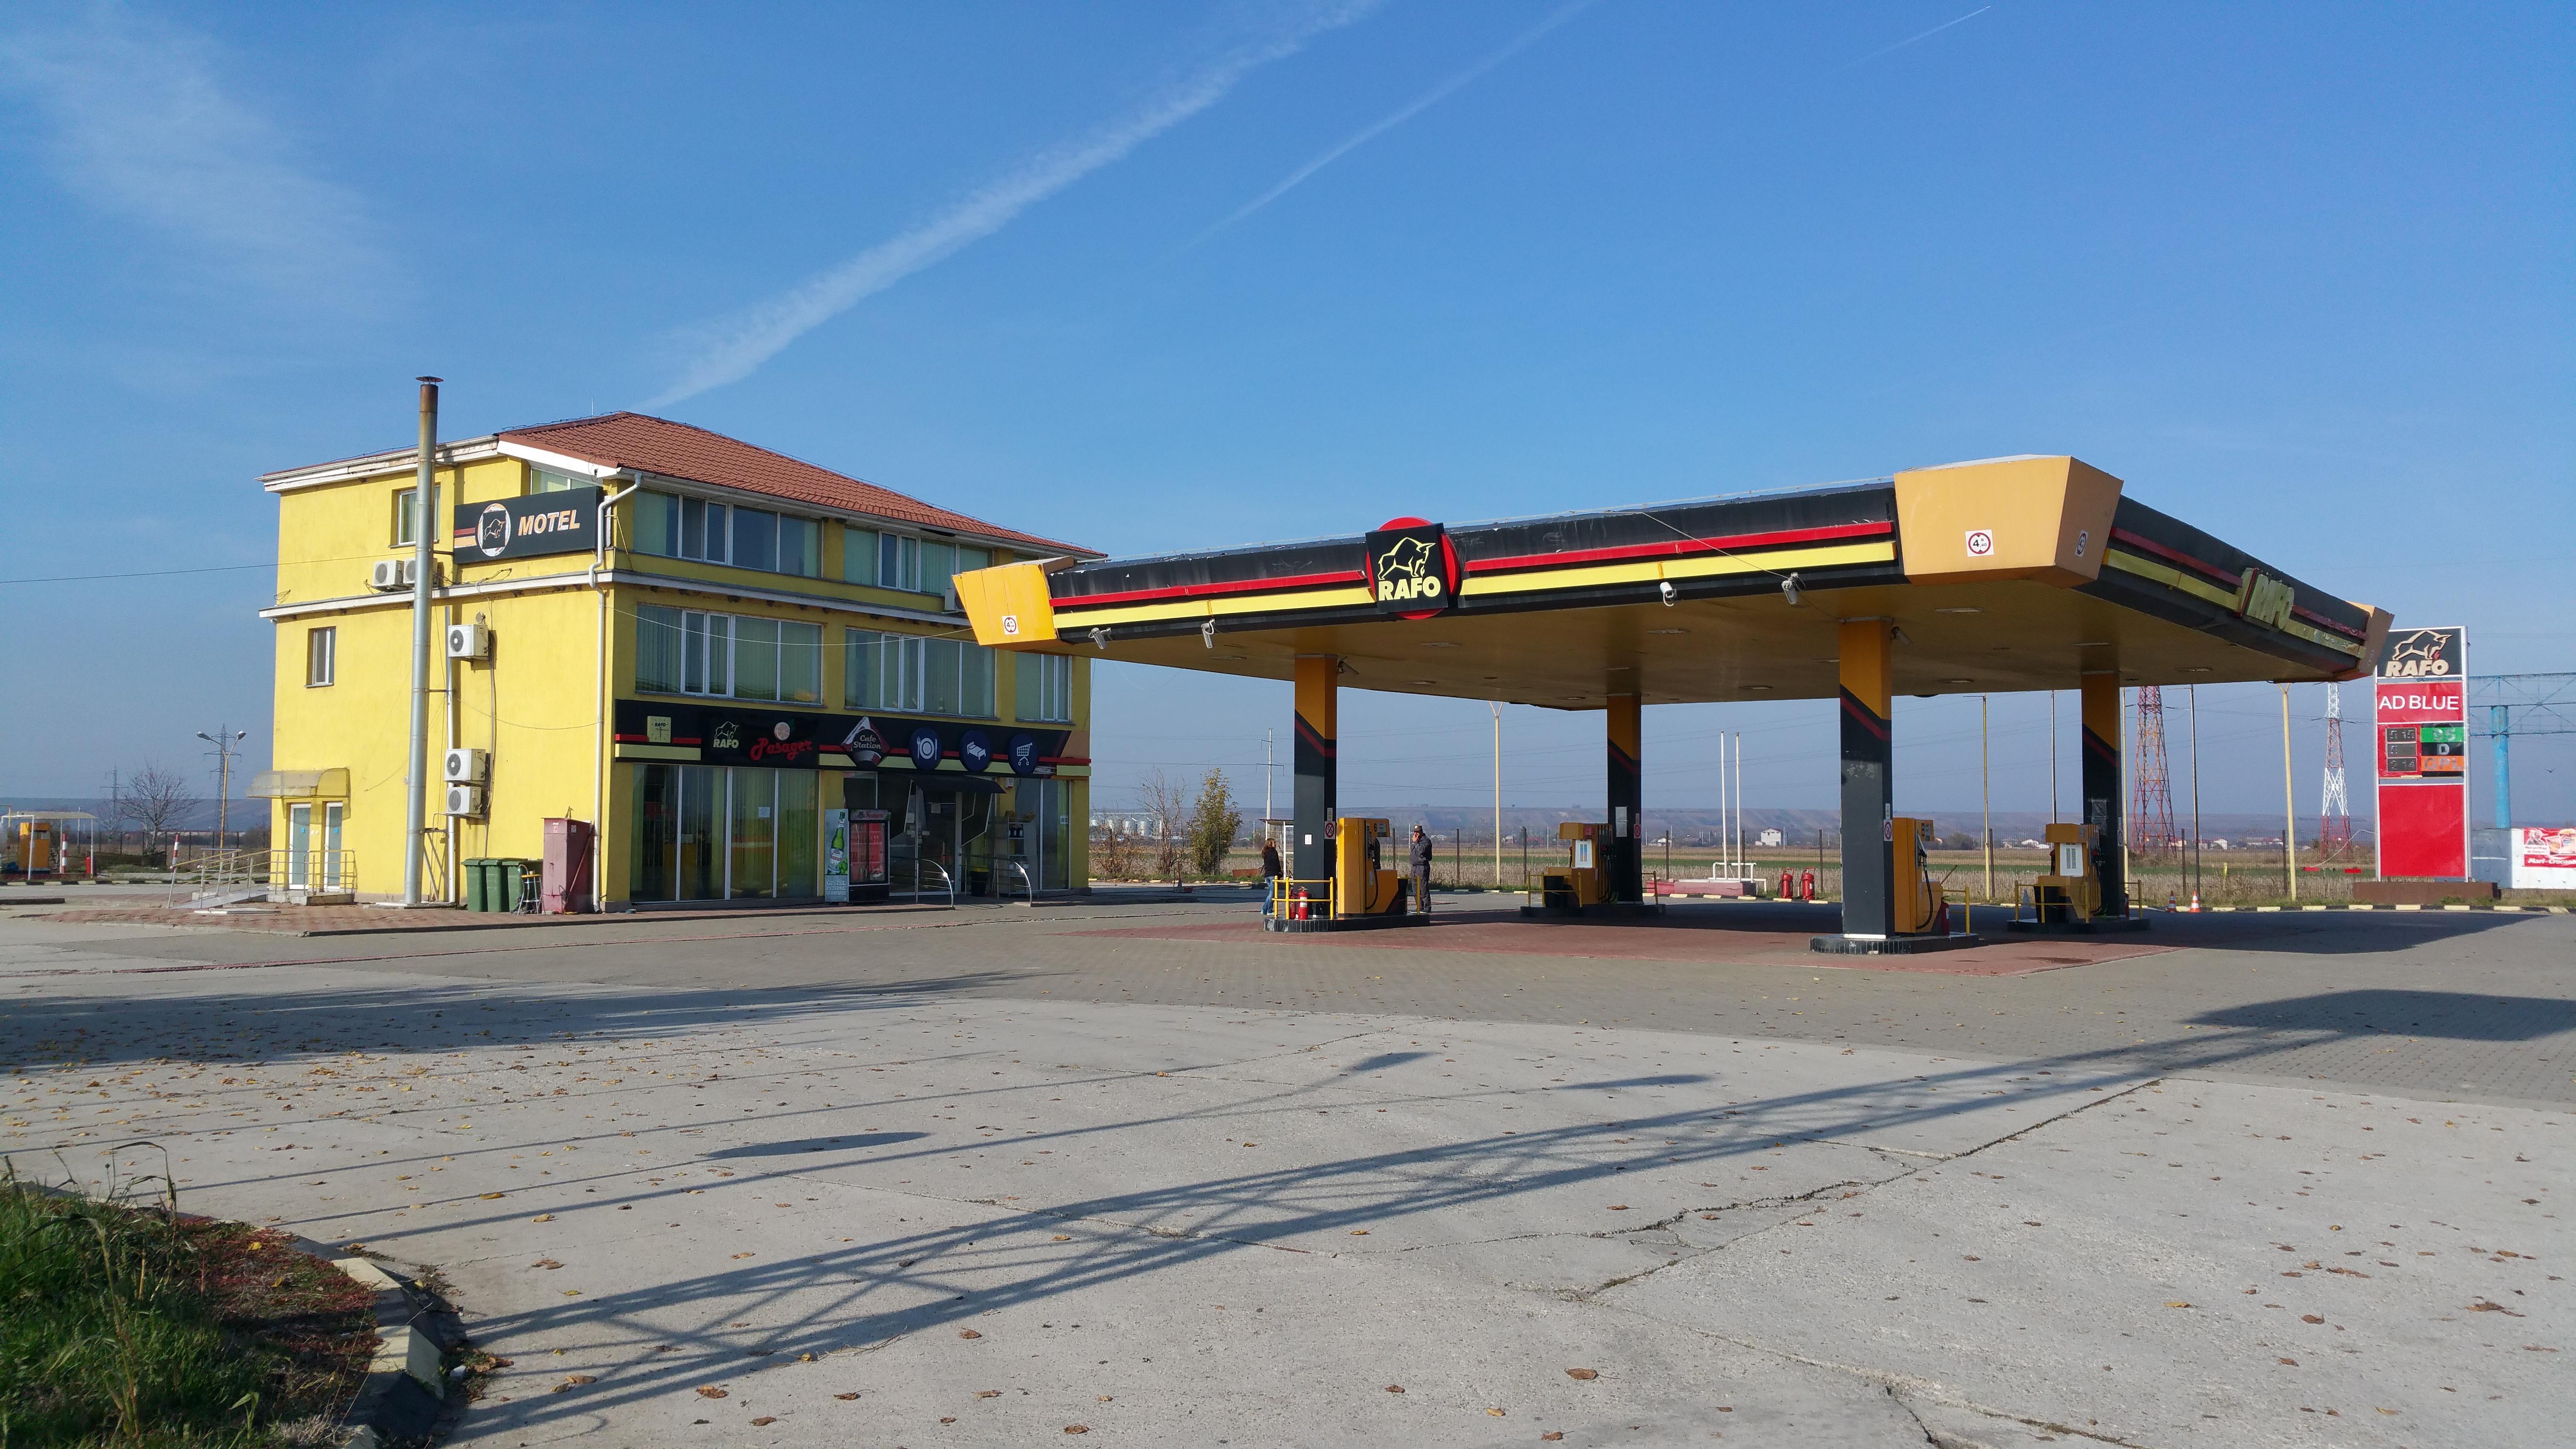 Stație distribuție carburanți sat Remus, com.Frățești DN5 km.5+705, jud.Giurgiu